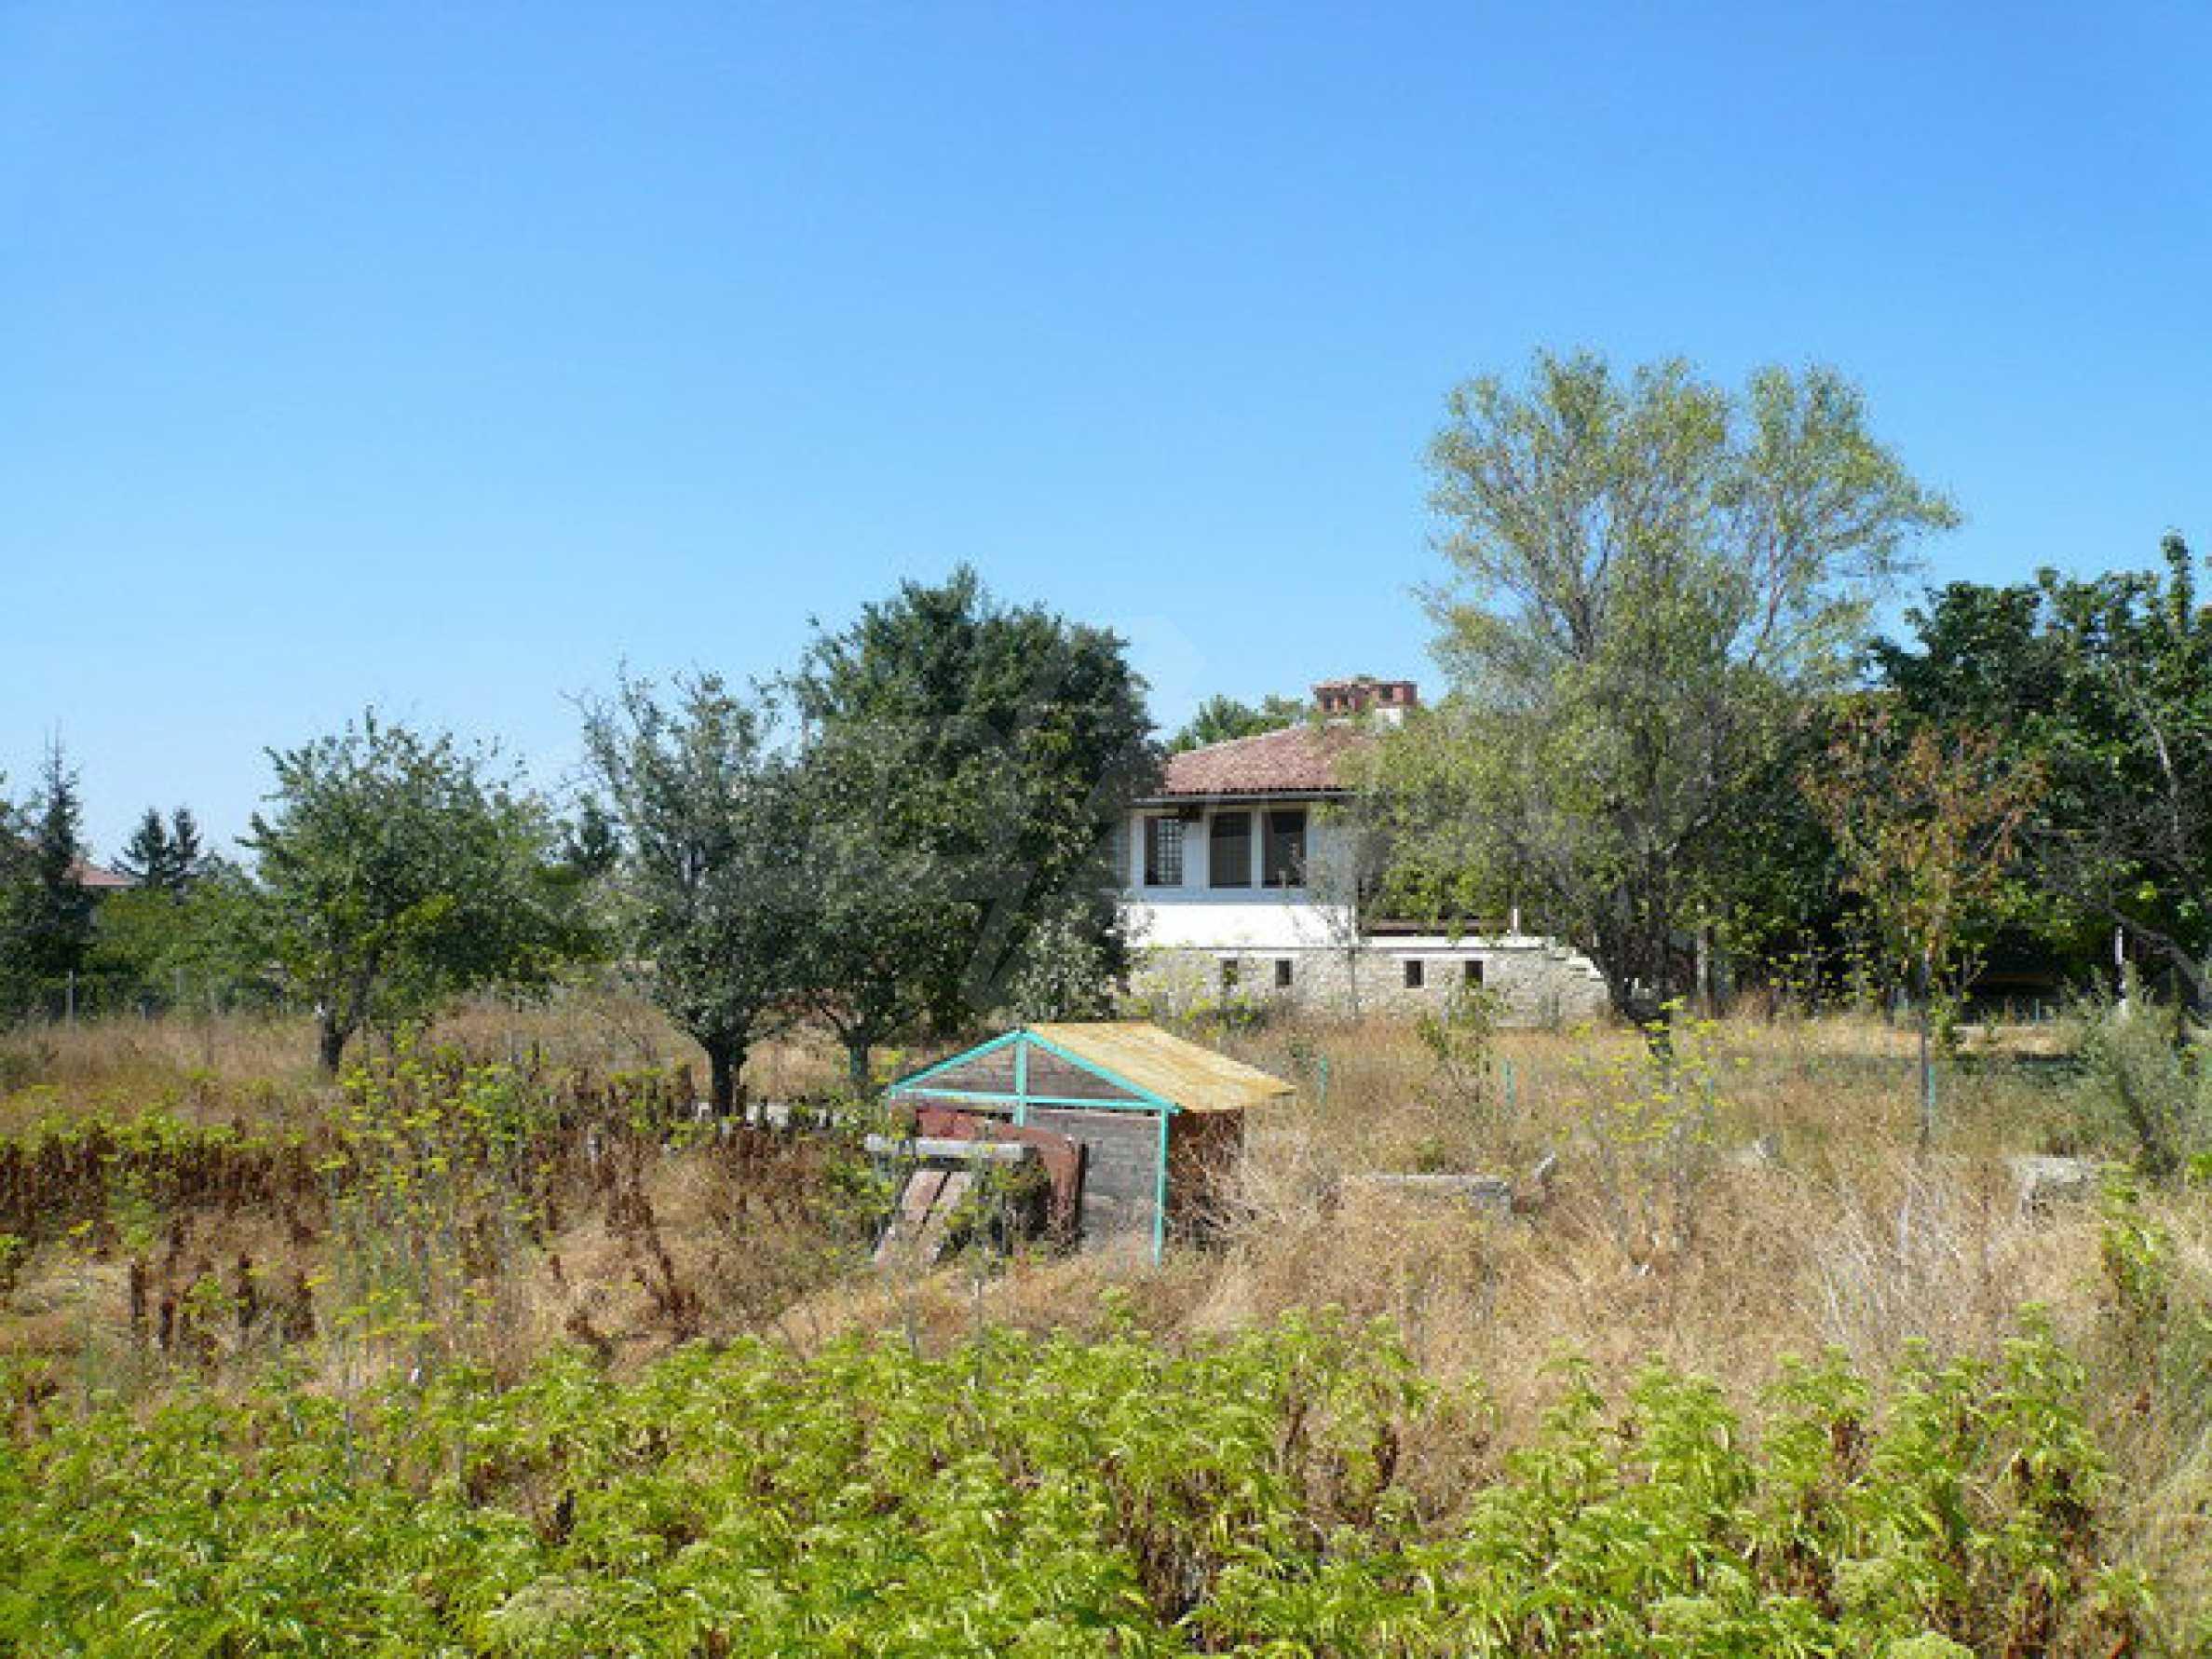 Renoviertes Haus nur 3 km von Veliko Tarnovo entfernt 44